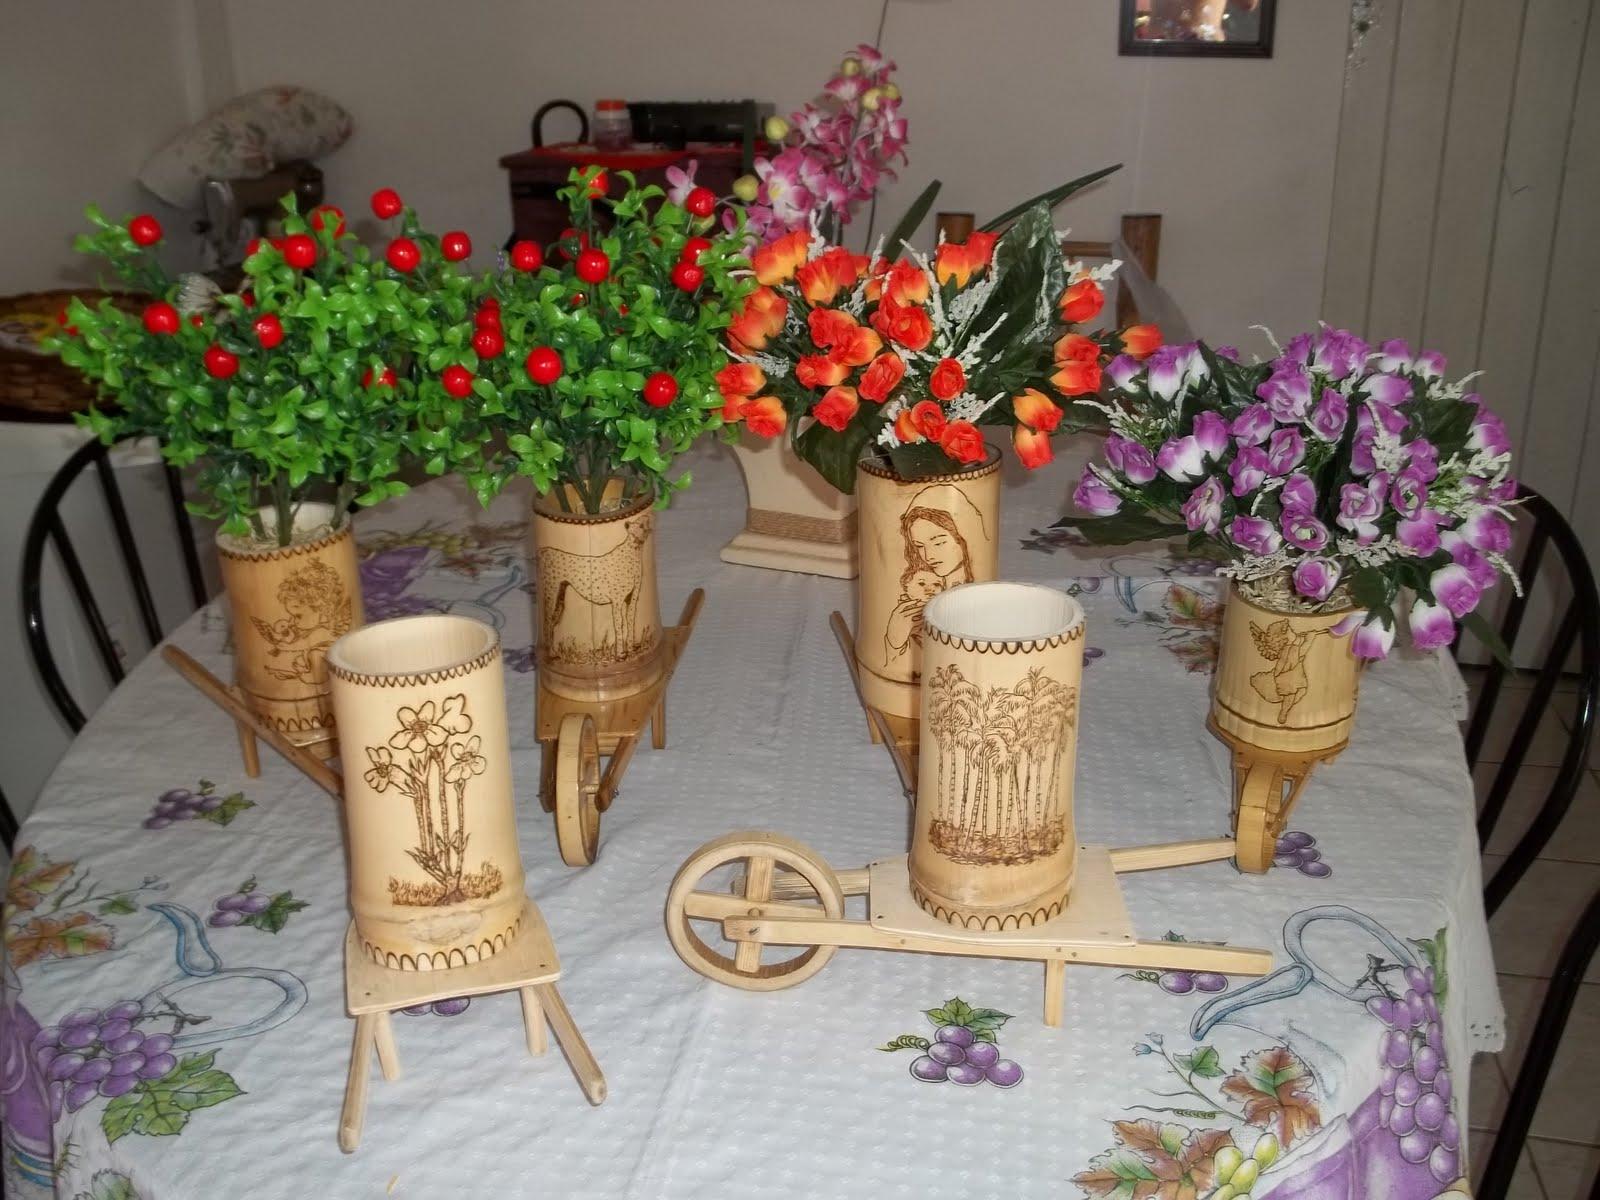 Artesanato Com Cd Velho ~ Arranjo floral Artesanato de bambu